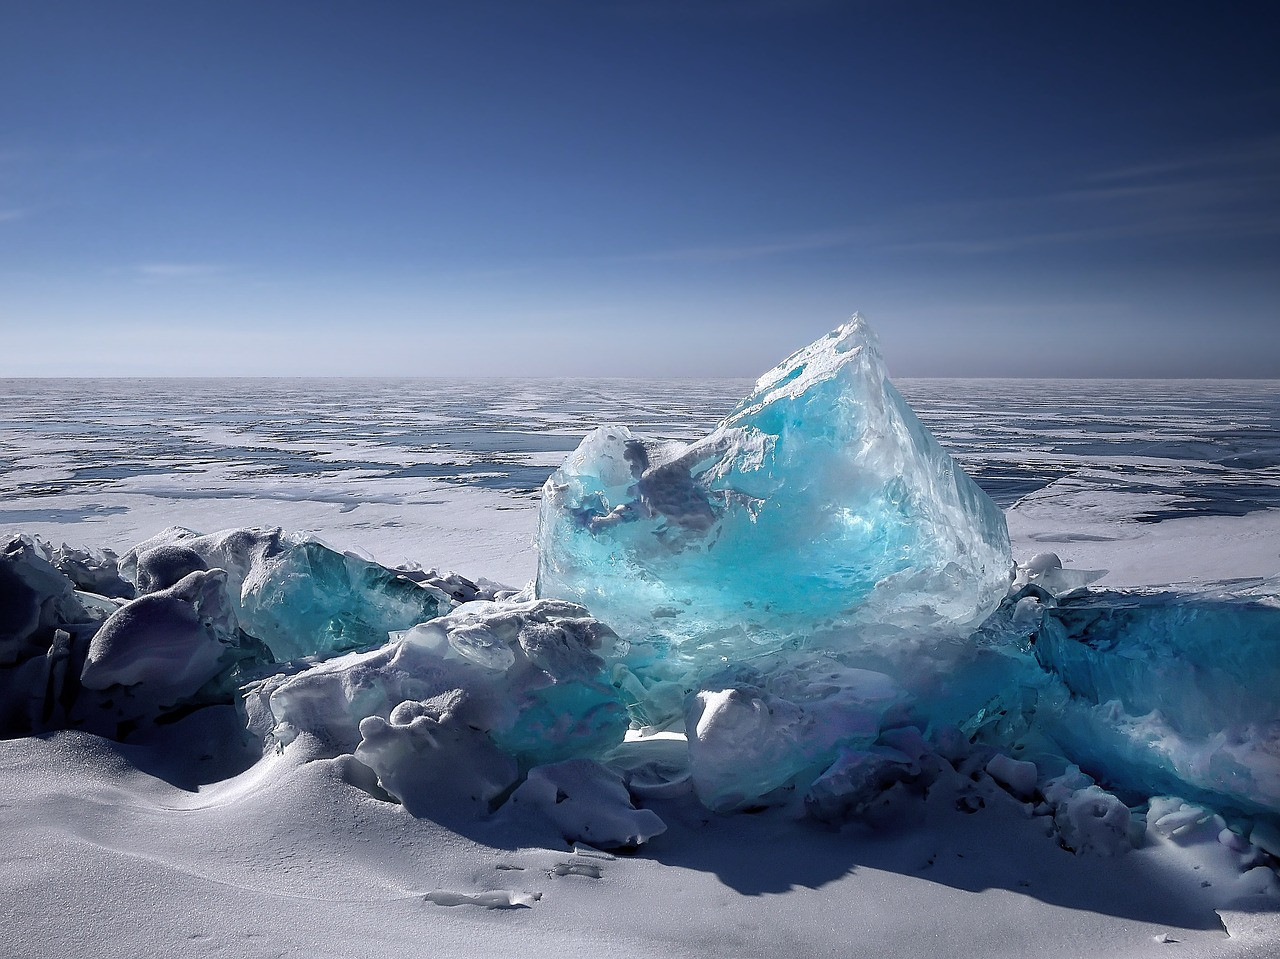 ice-2062433_1280.jpg